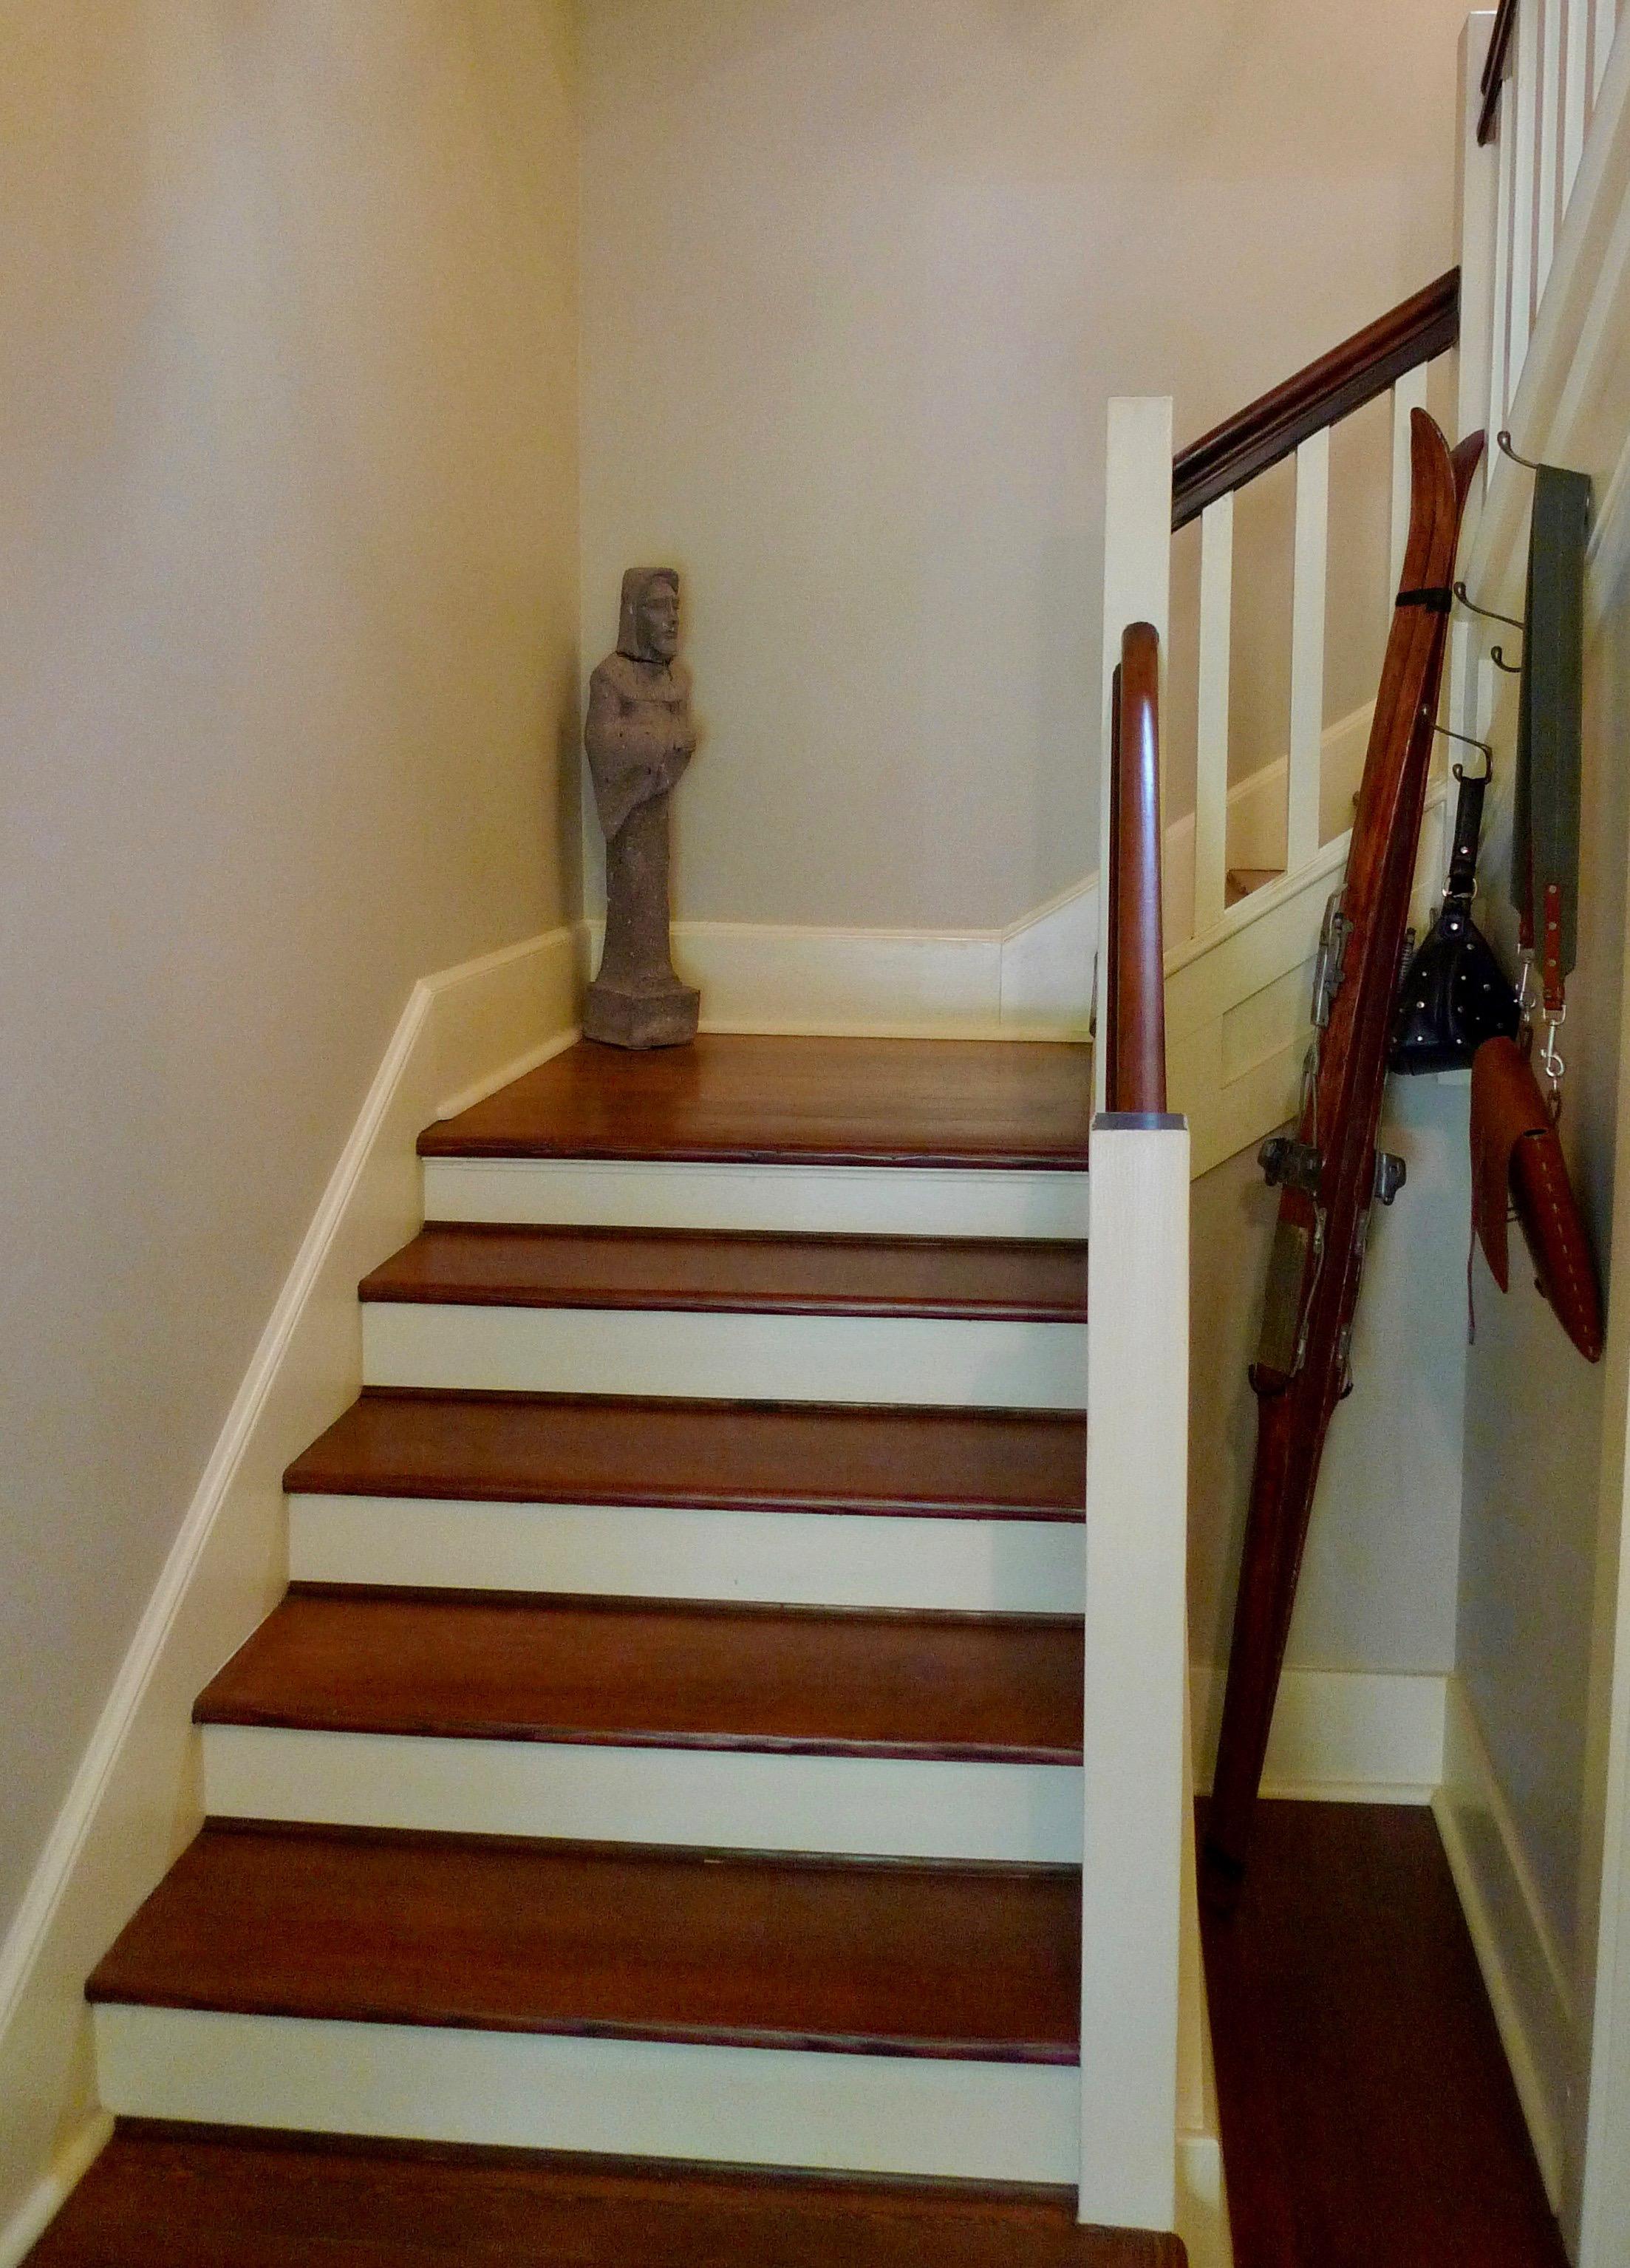 825 Ridgeway stairs 1 after.jpg